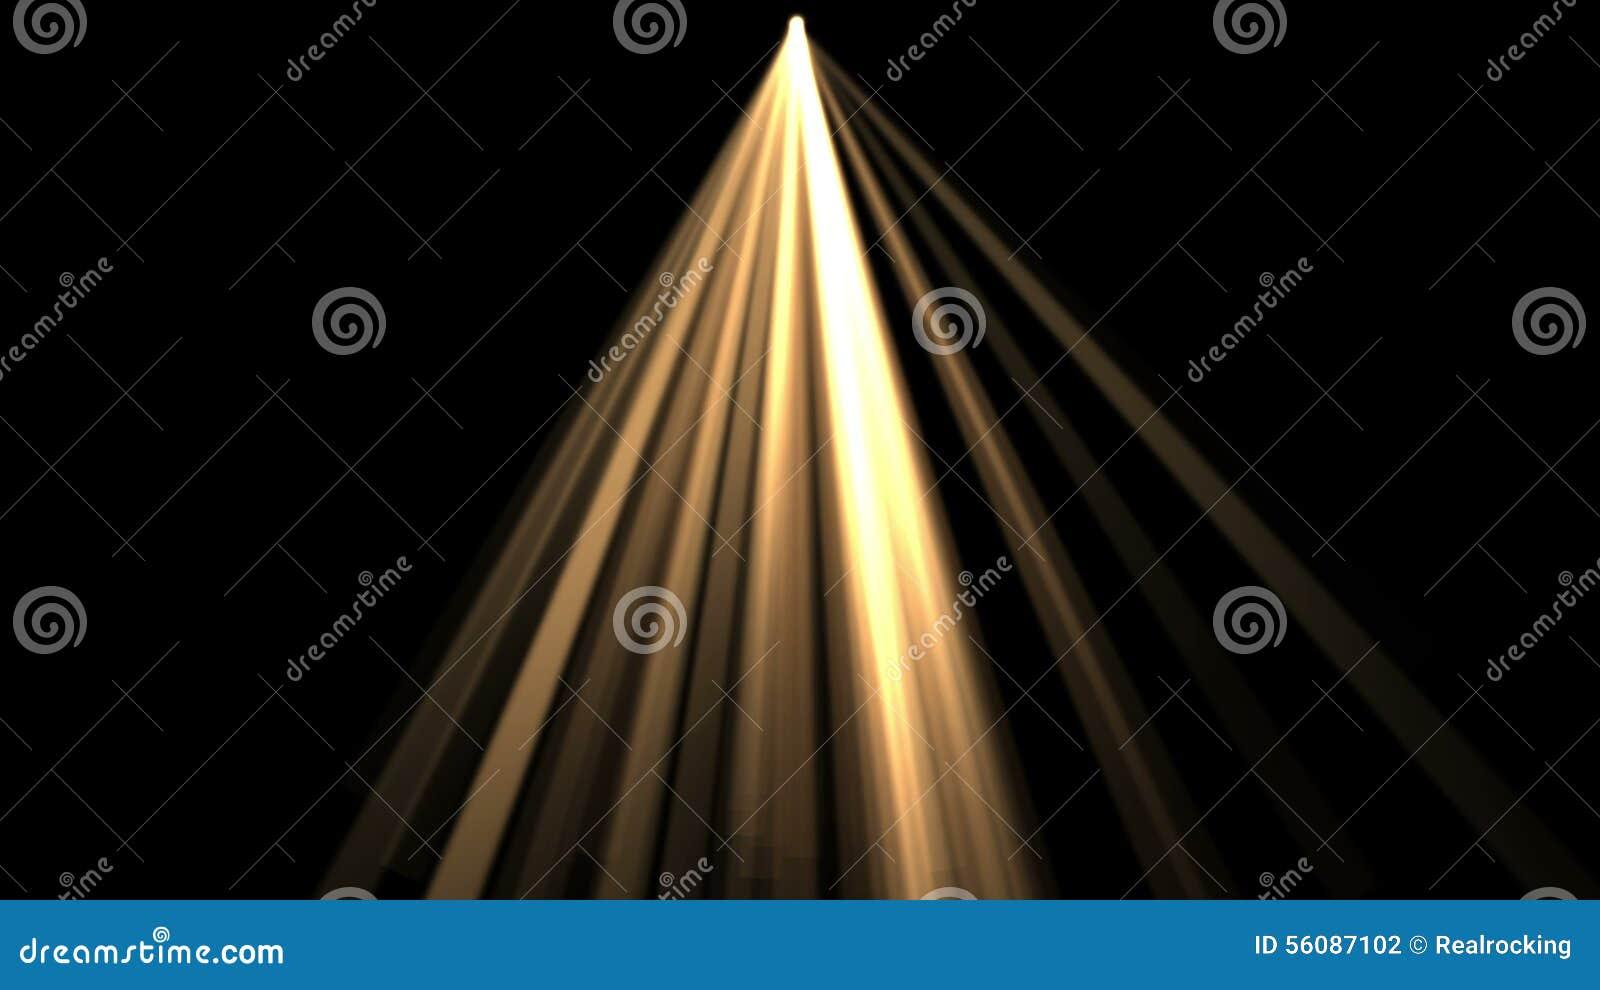 4k Ray Stage Lighting Backgroundradiation Laser Energytunnel Passage Line Stock Footage